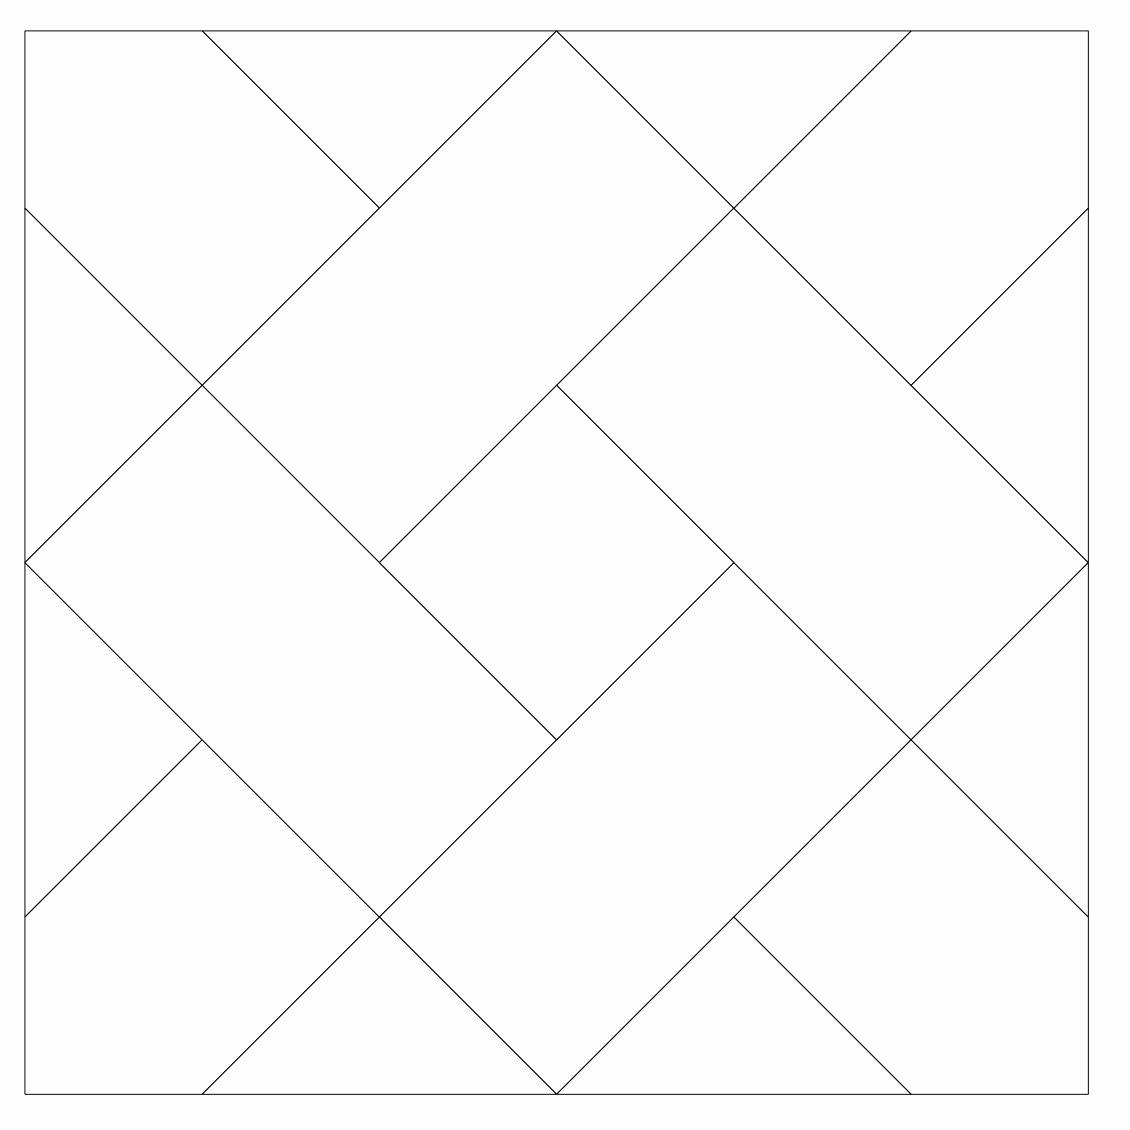 Pattern Block Templates Pdf Luxury Pattern Block Templates